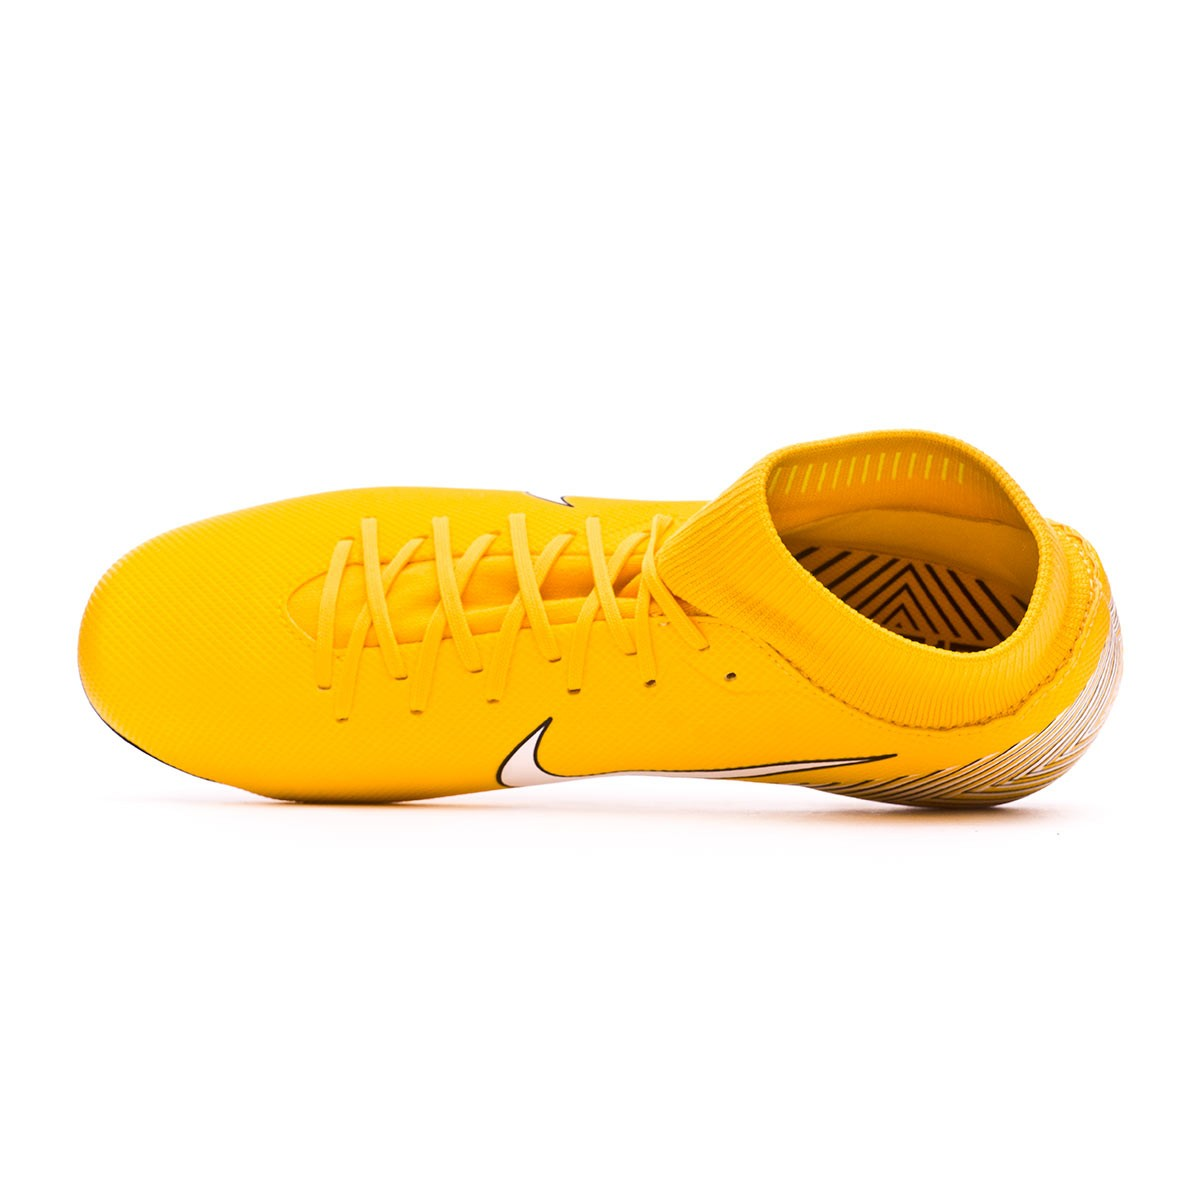 e8ac8c8e38b0 Football Boots Nike Mercurial Superfly VI Academy MG Neymar Yellow-Black -  Football store Fútbol Emotion